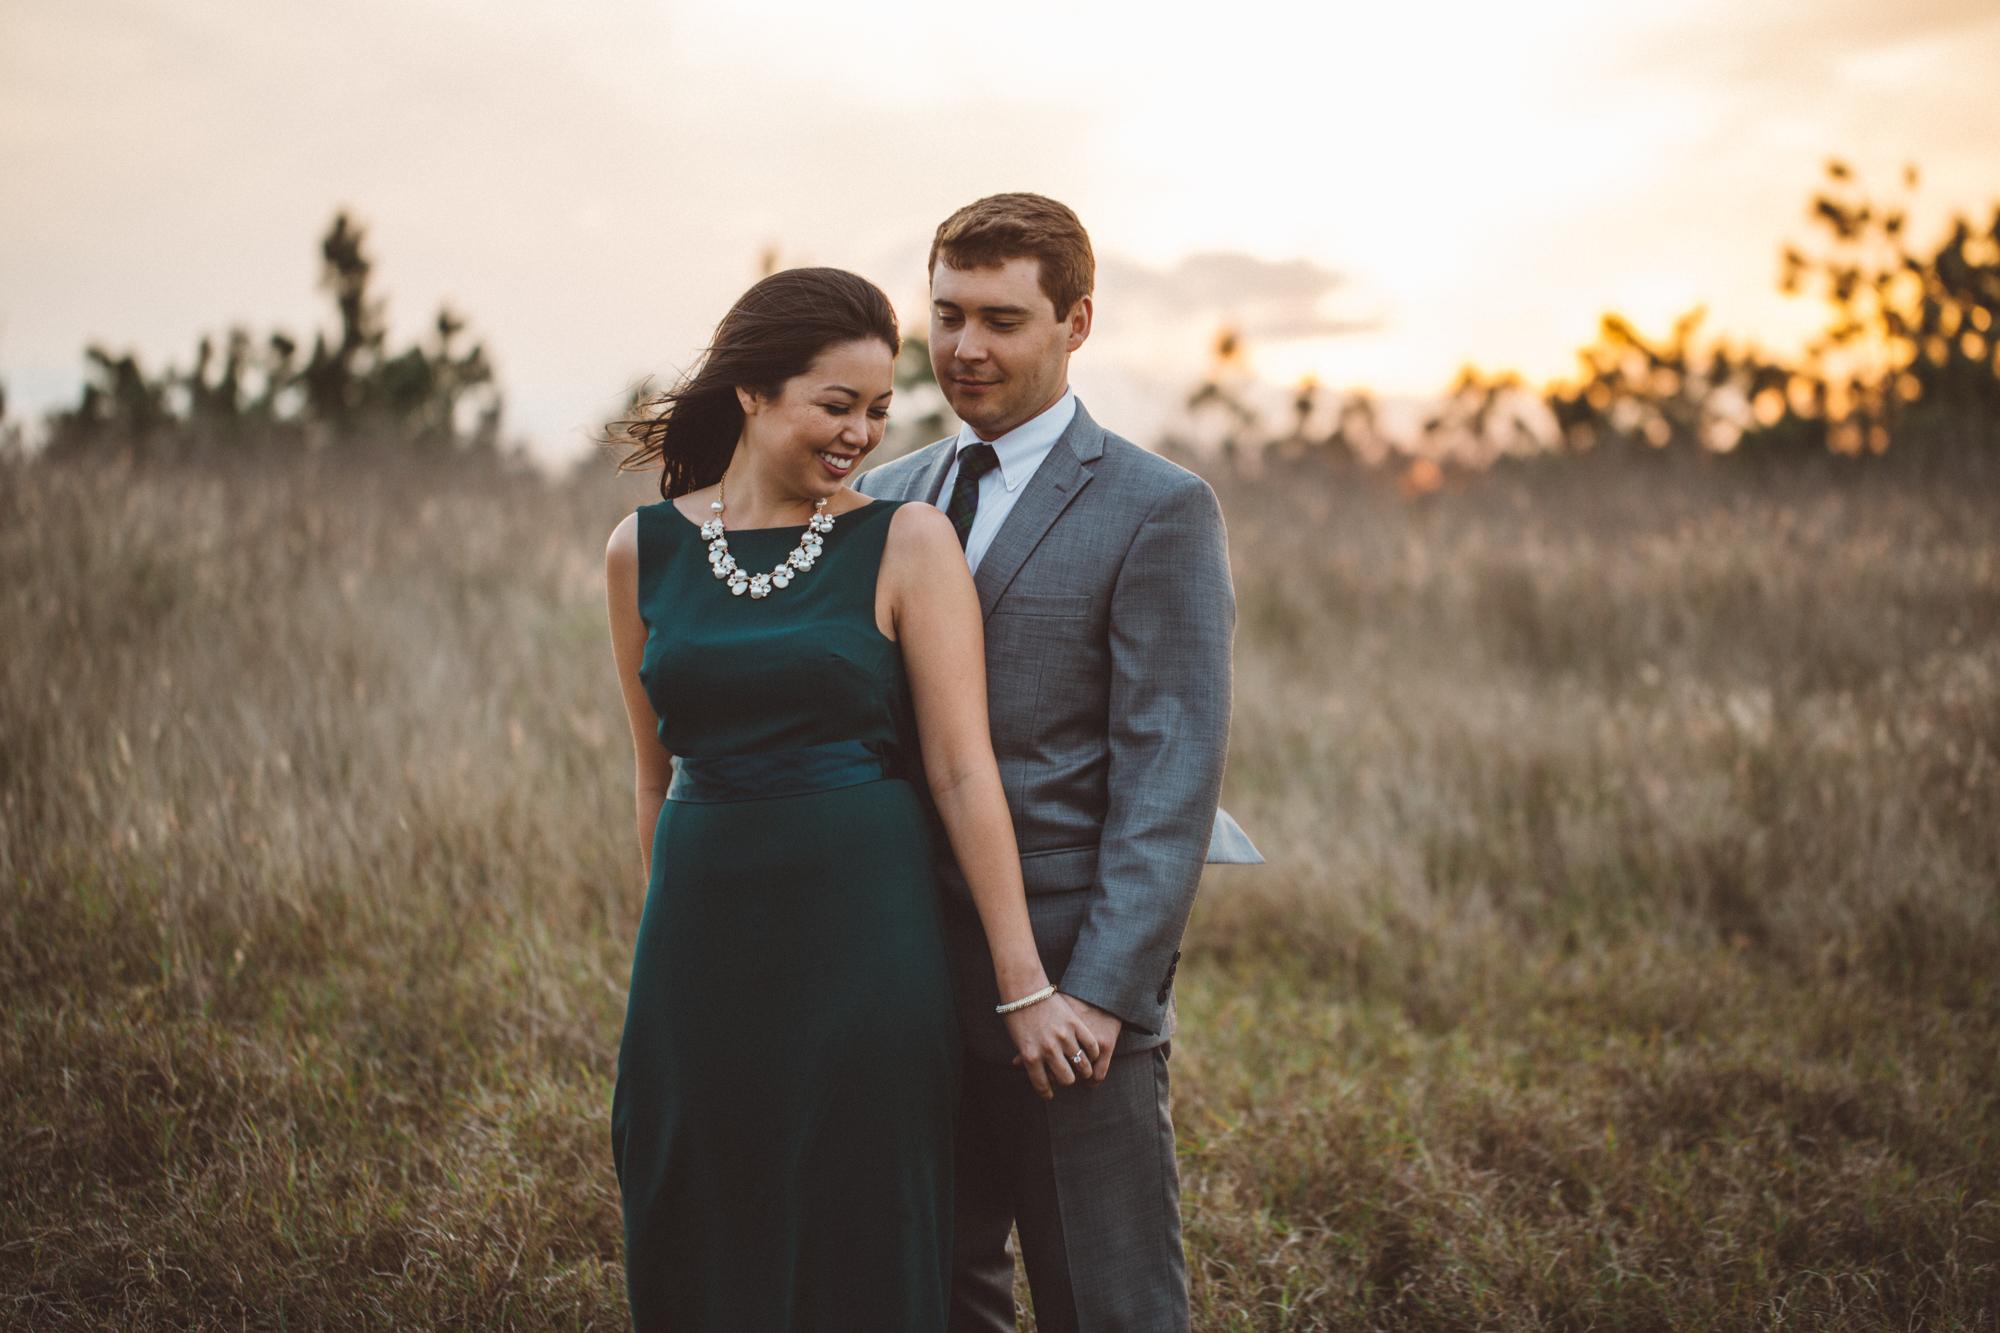 Orlando Engagement Photographer-77.jpg